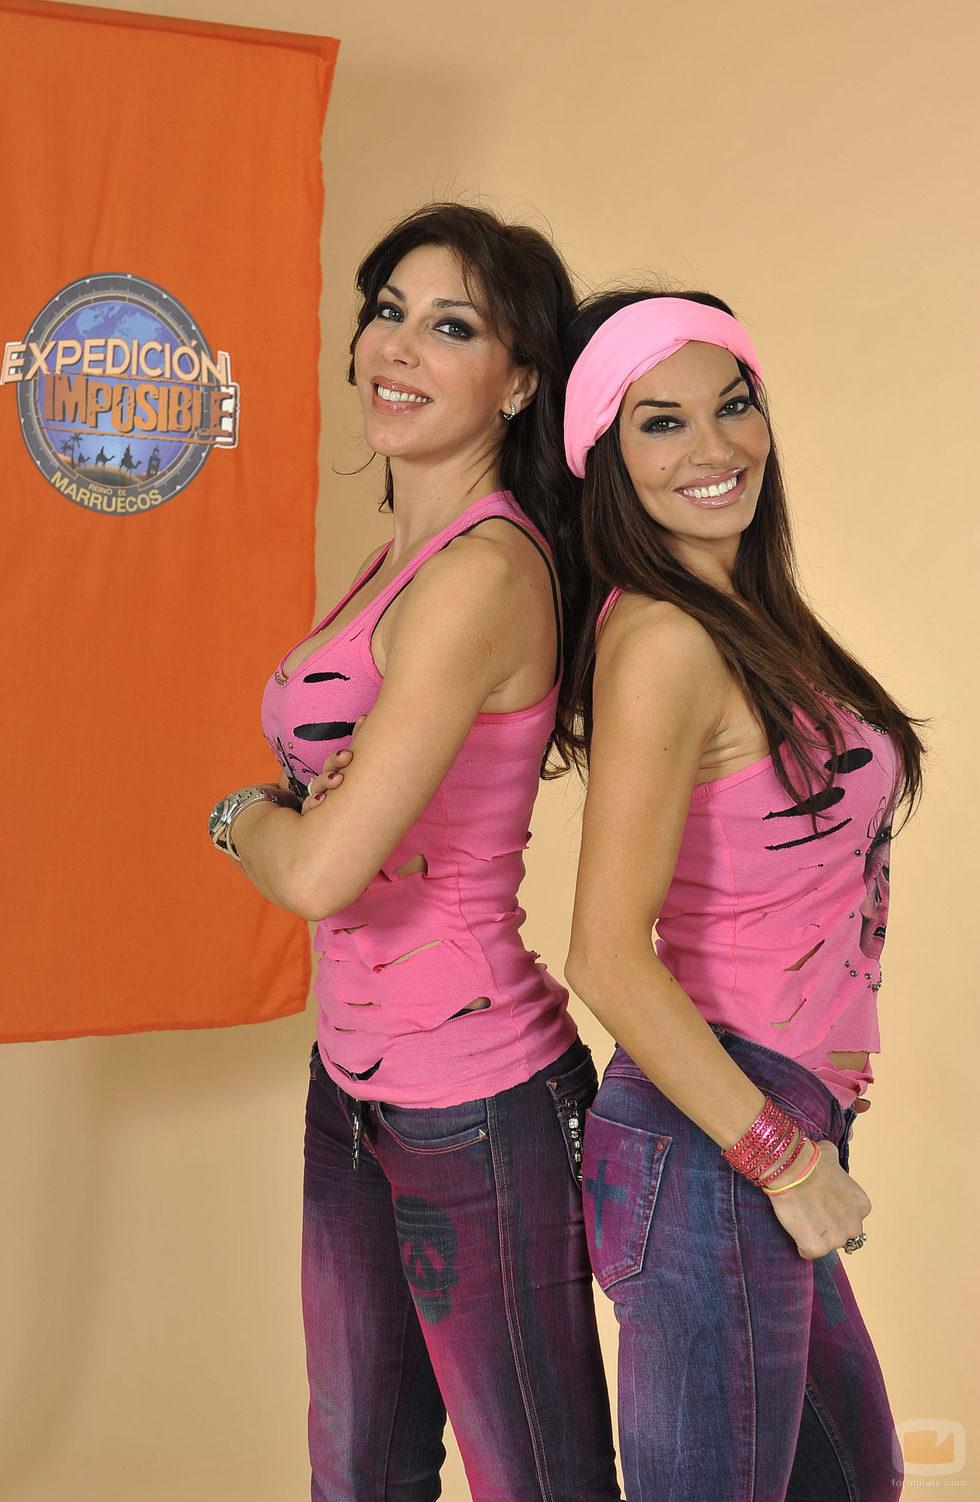 María y Romy Abradelo, concursantes de 'Expedición imposible'